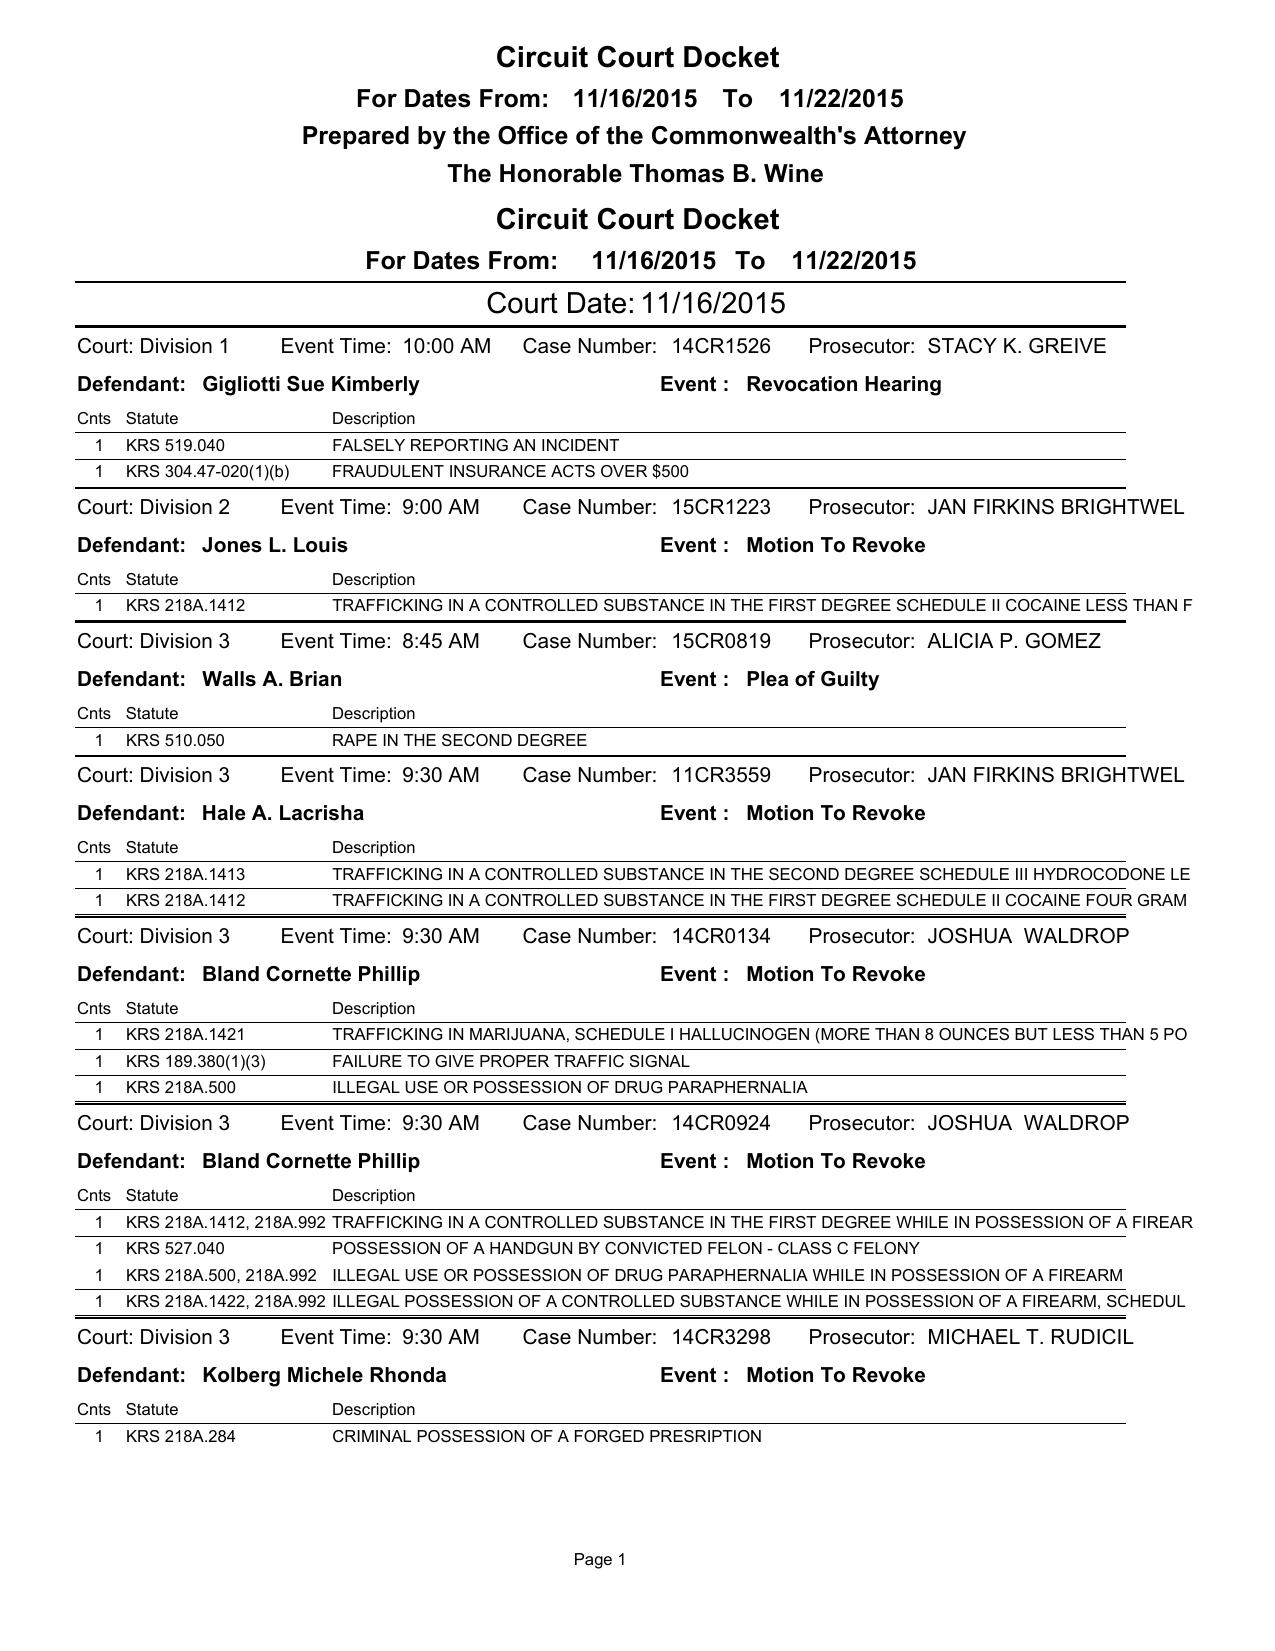 Circuit Court Docket, week of November 16